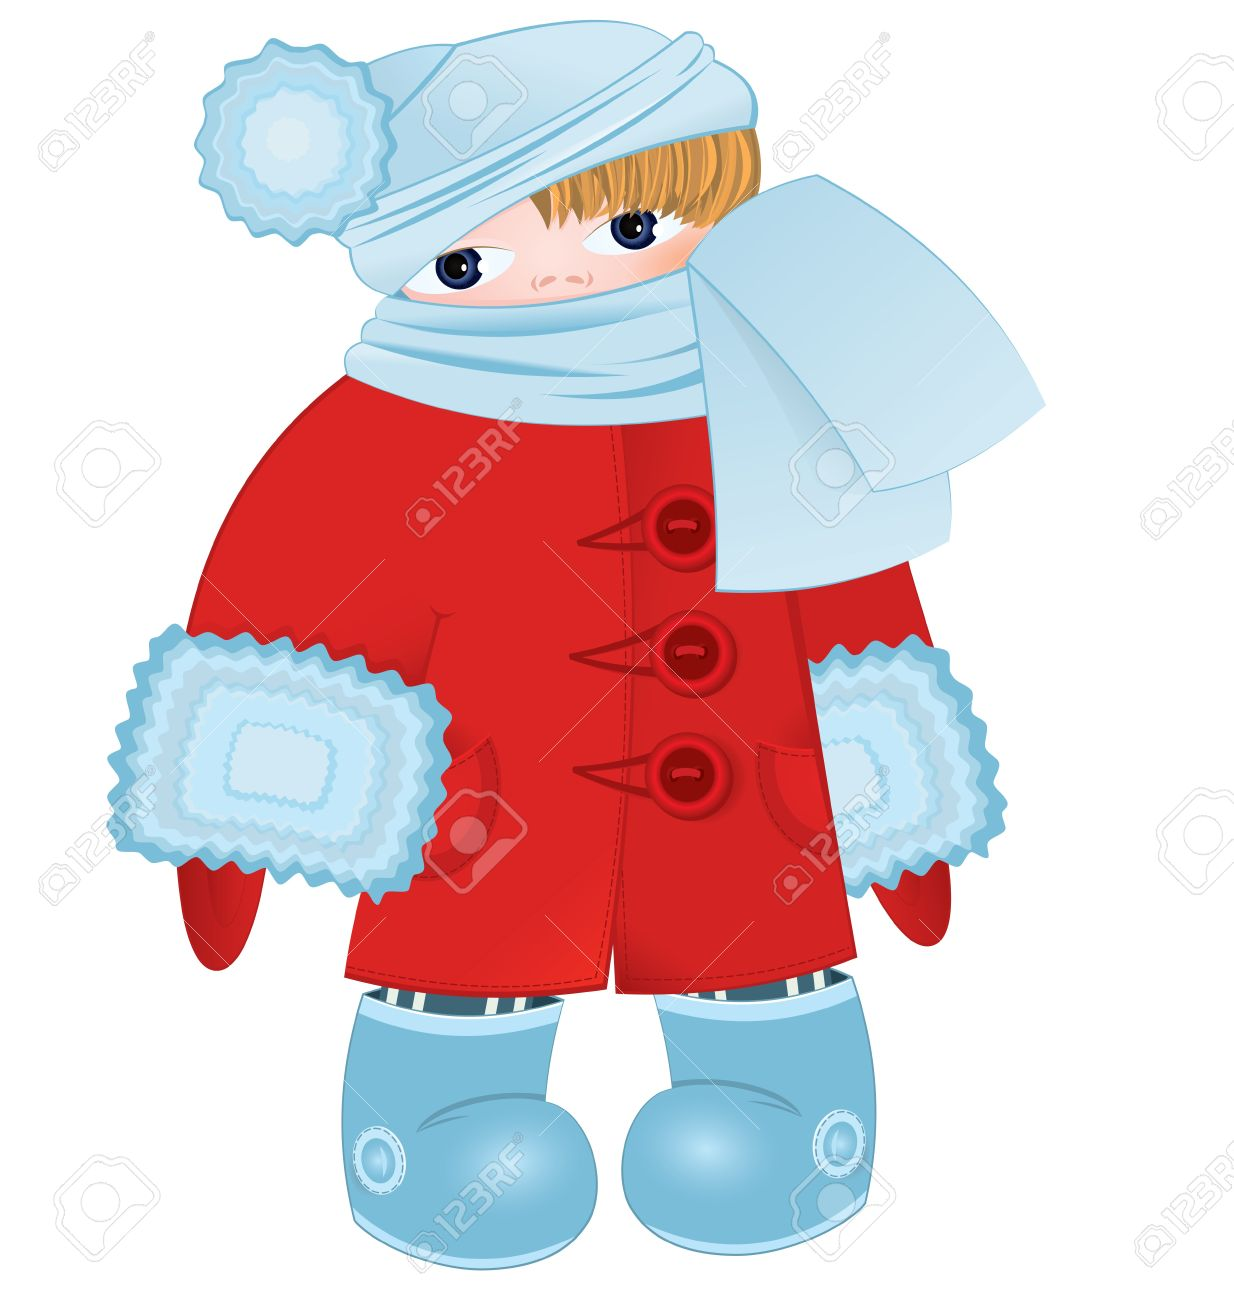 Image result for winter coat cartoon